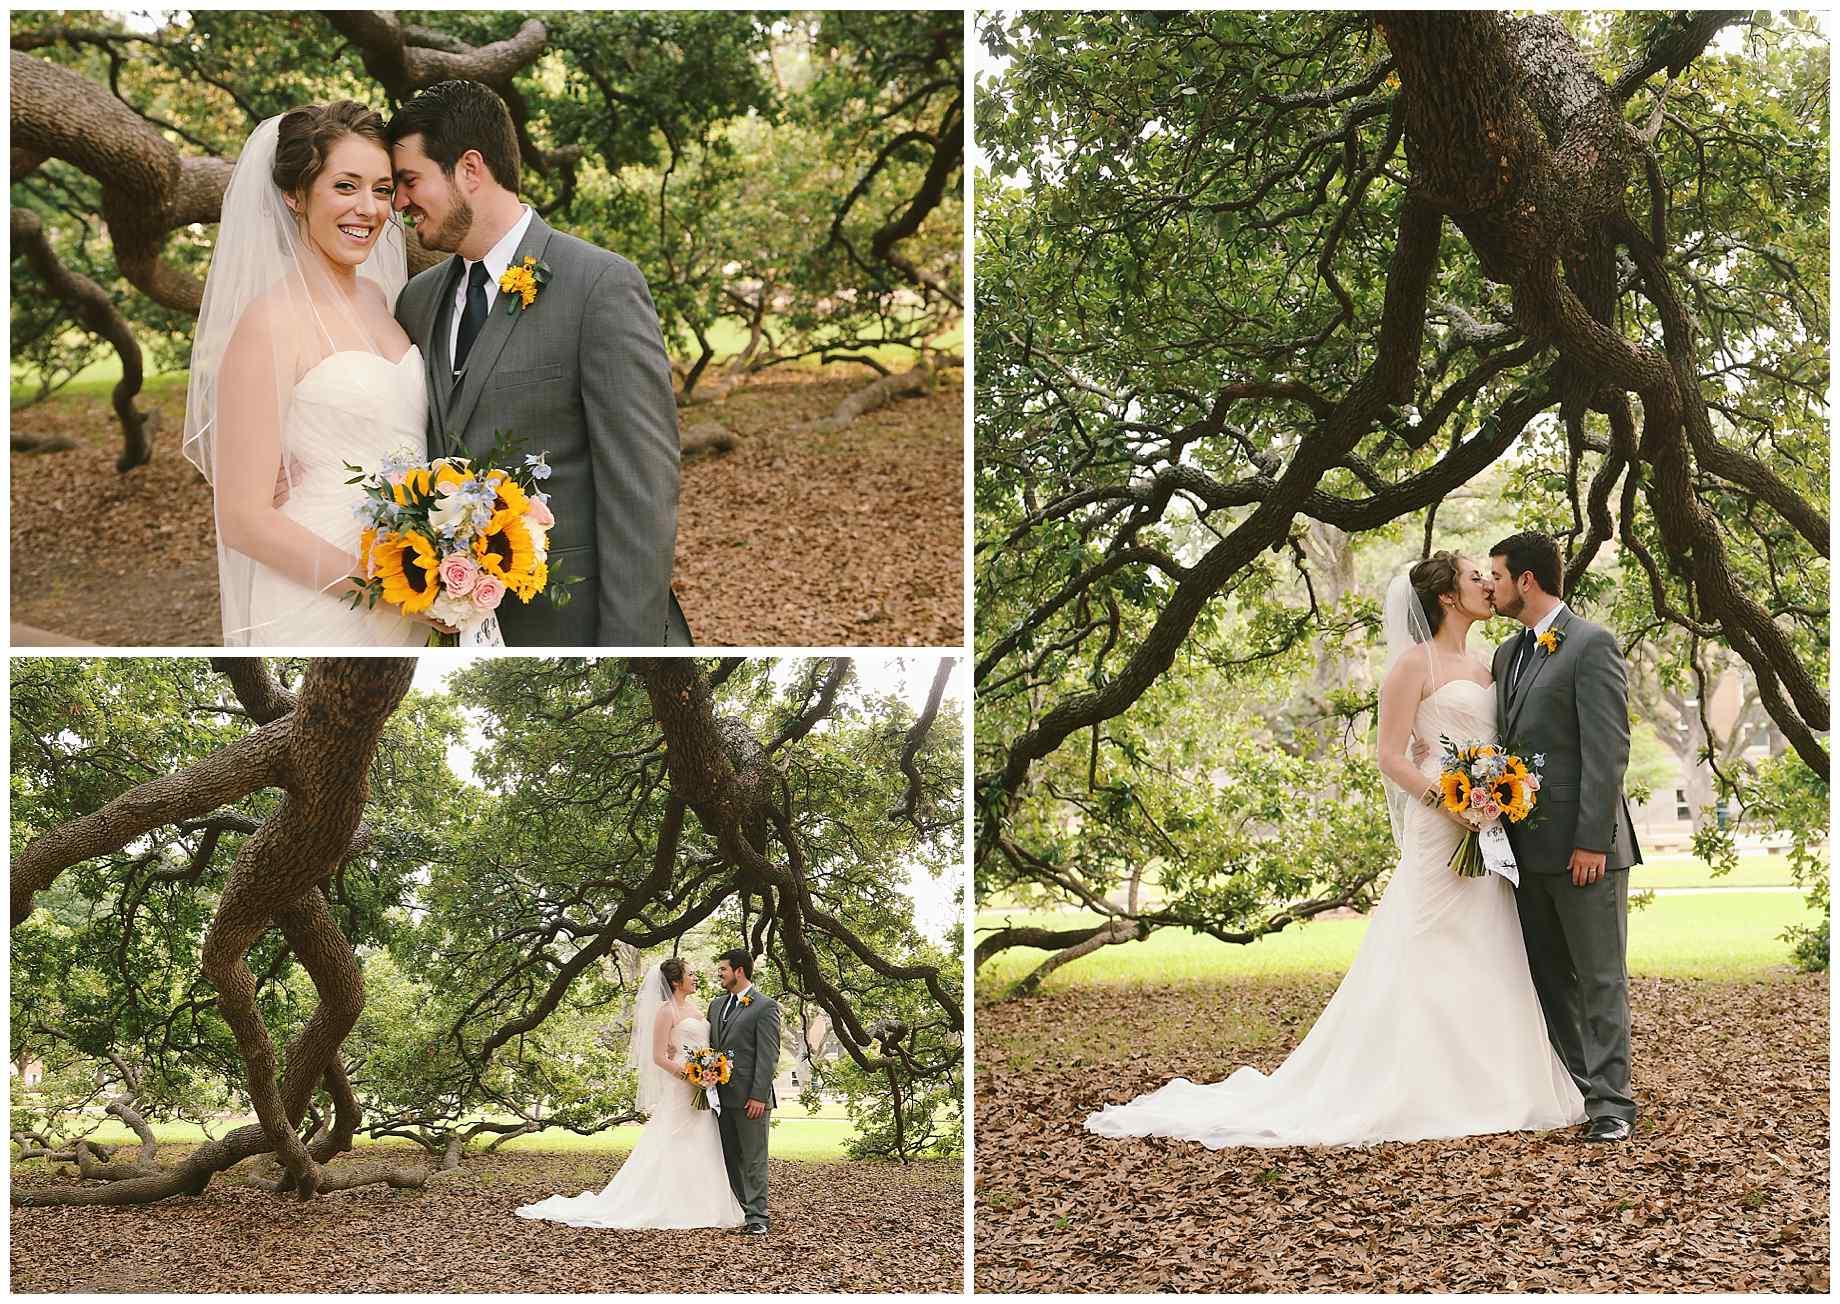 aggie-century-tree-wedding-22